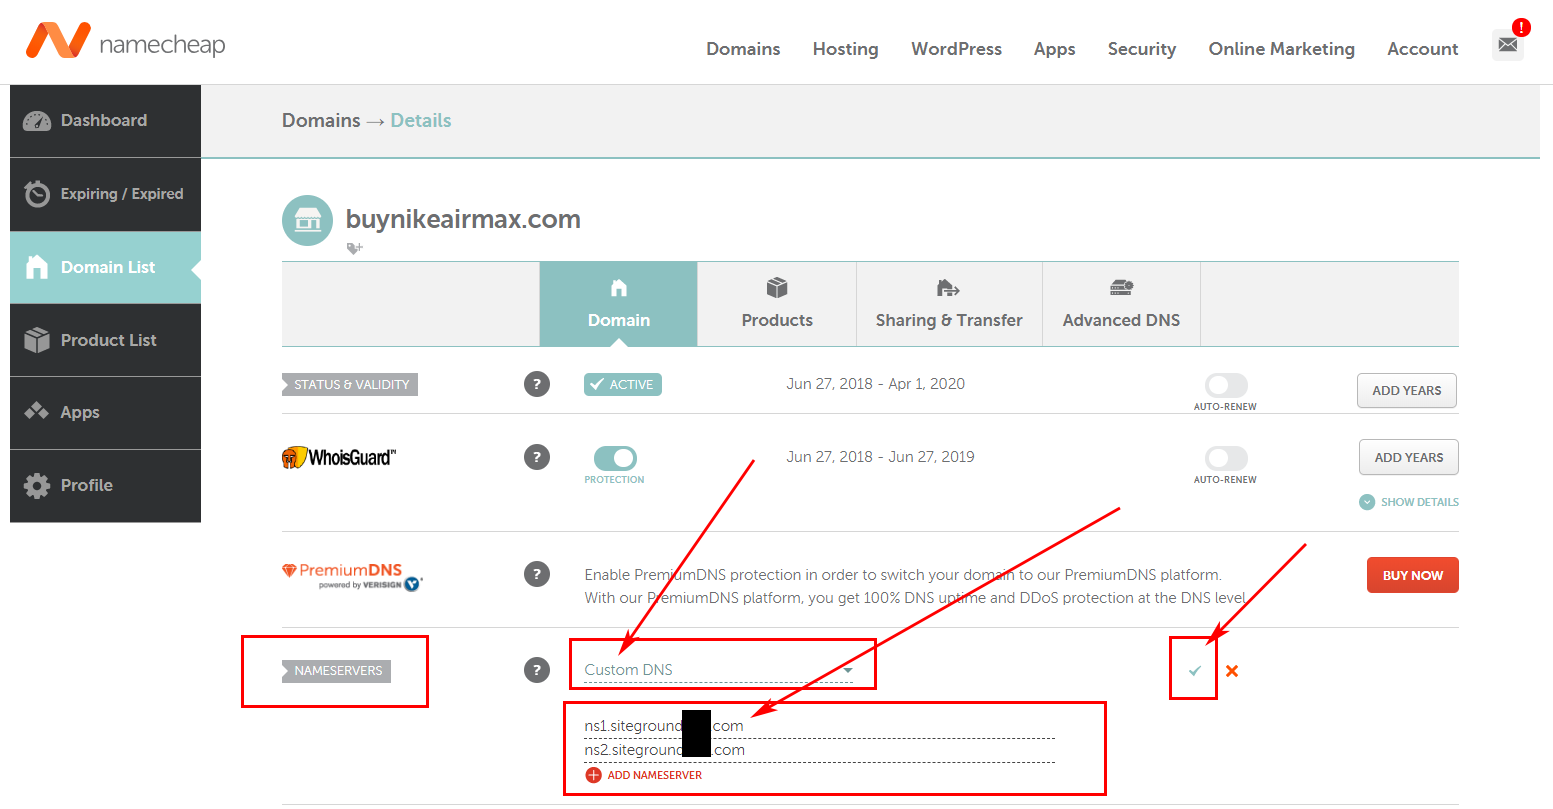 Hosting & Website With WordPress - Namecheap NAMESERVERS